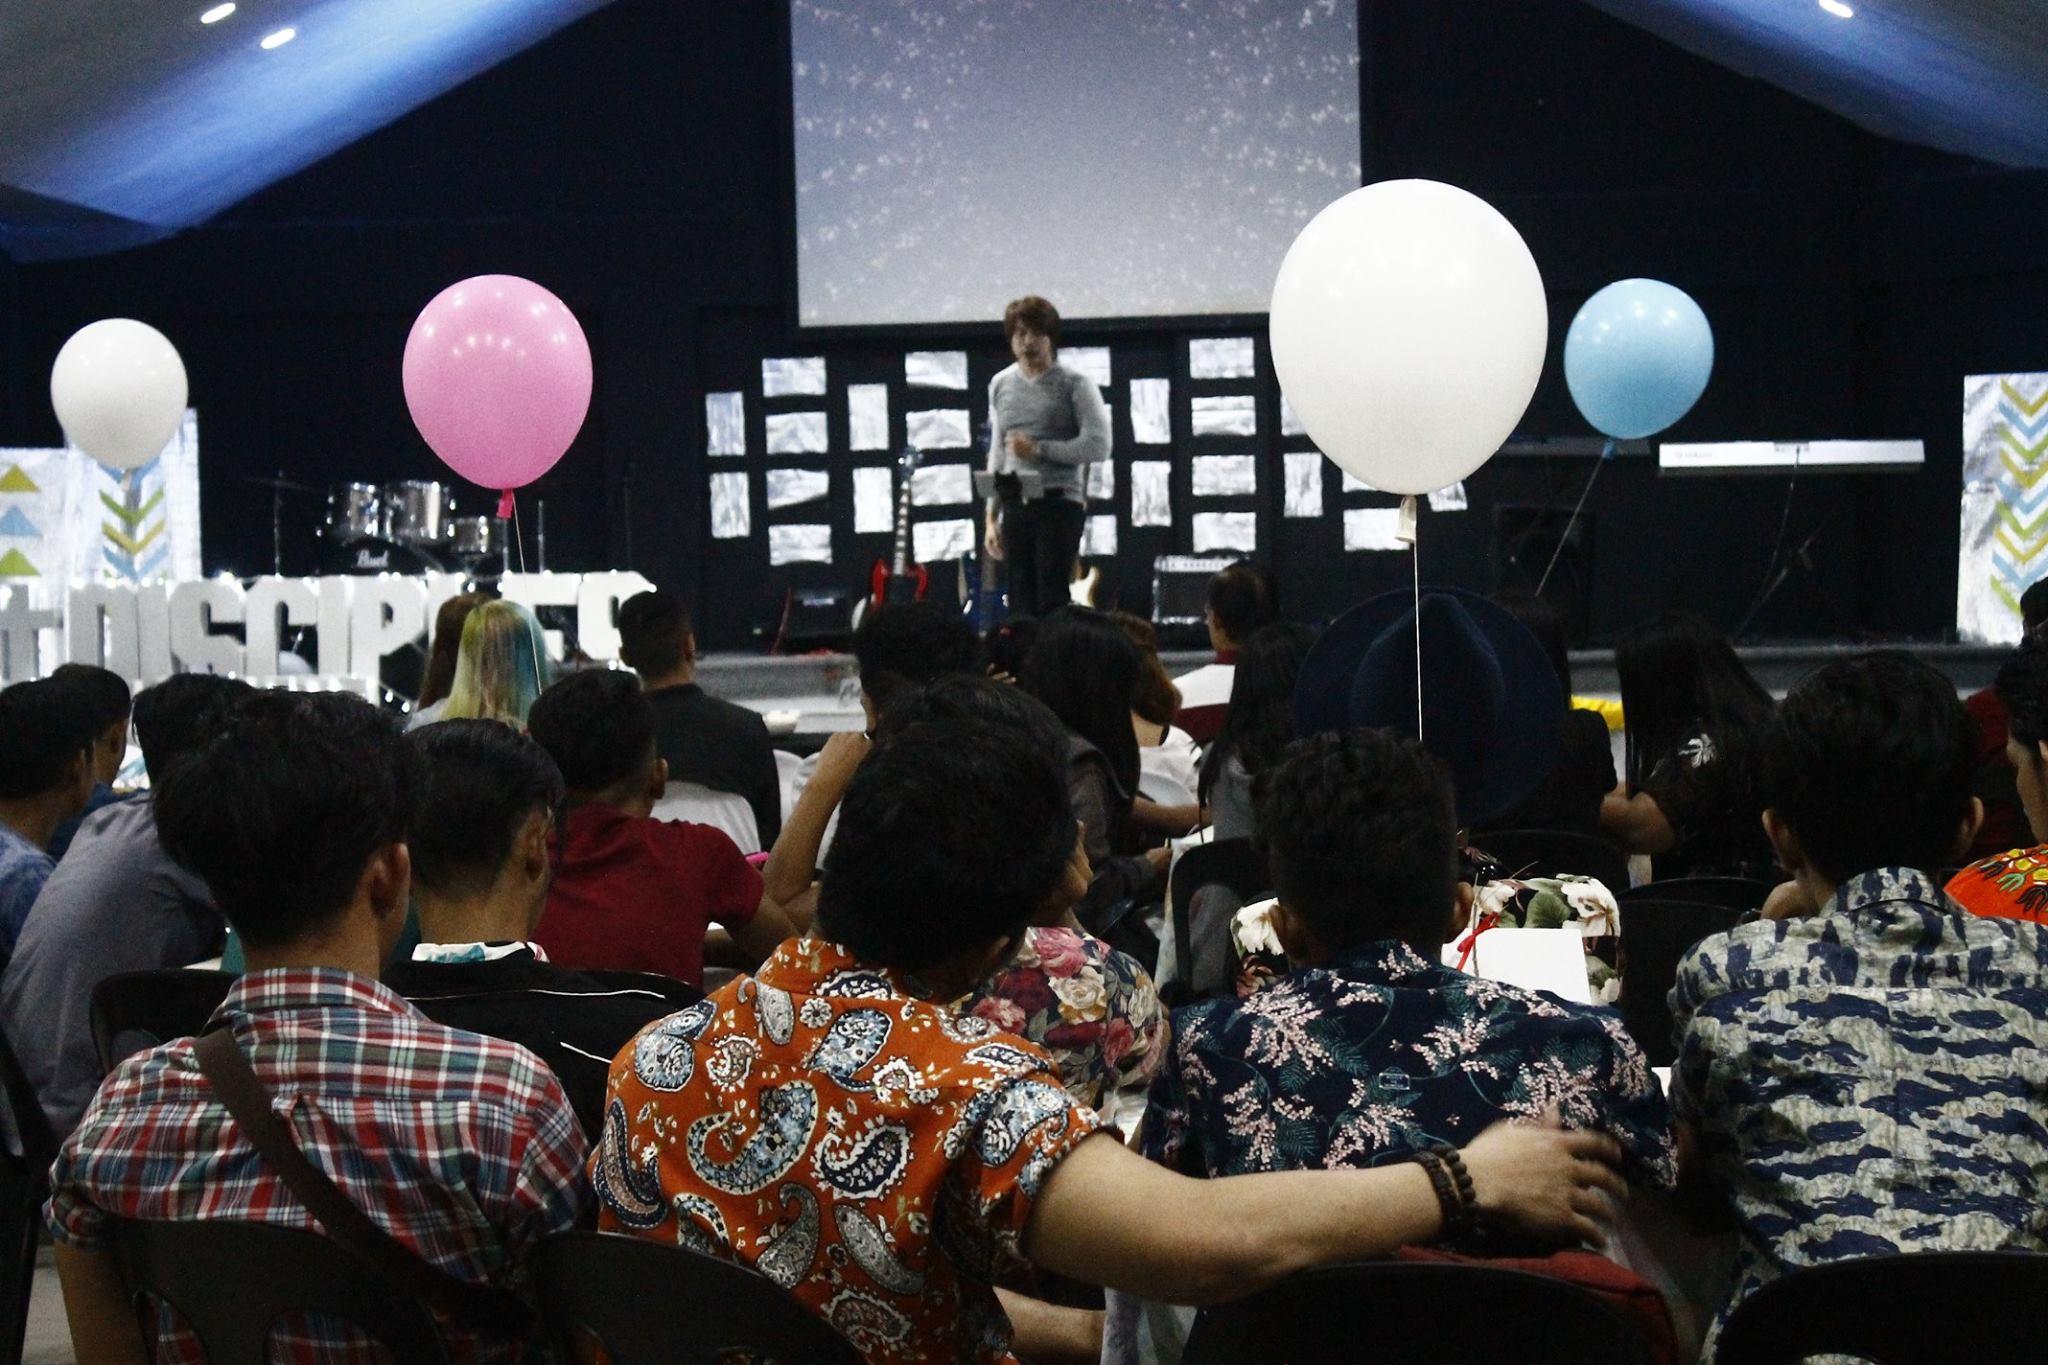 Brethren Of Christ In The Philippines